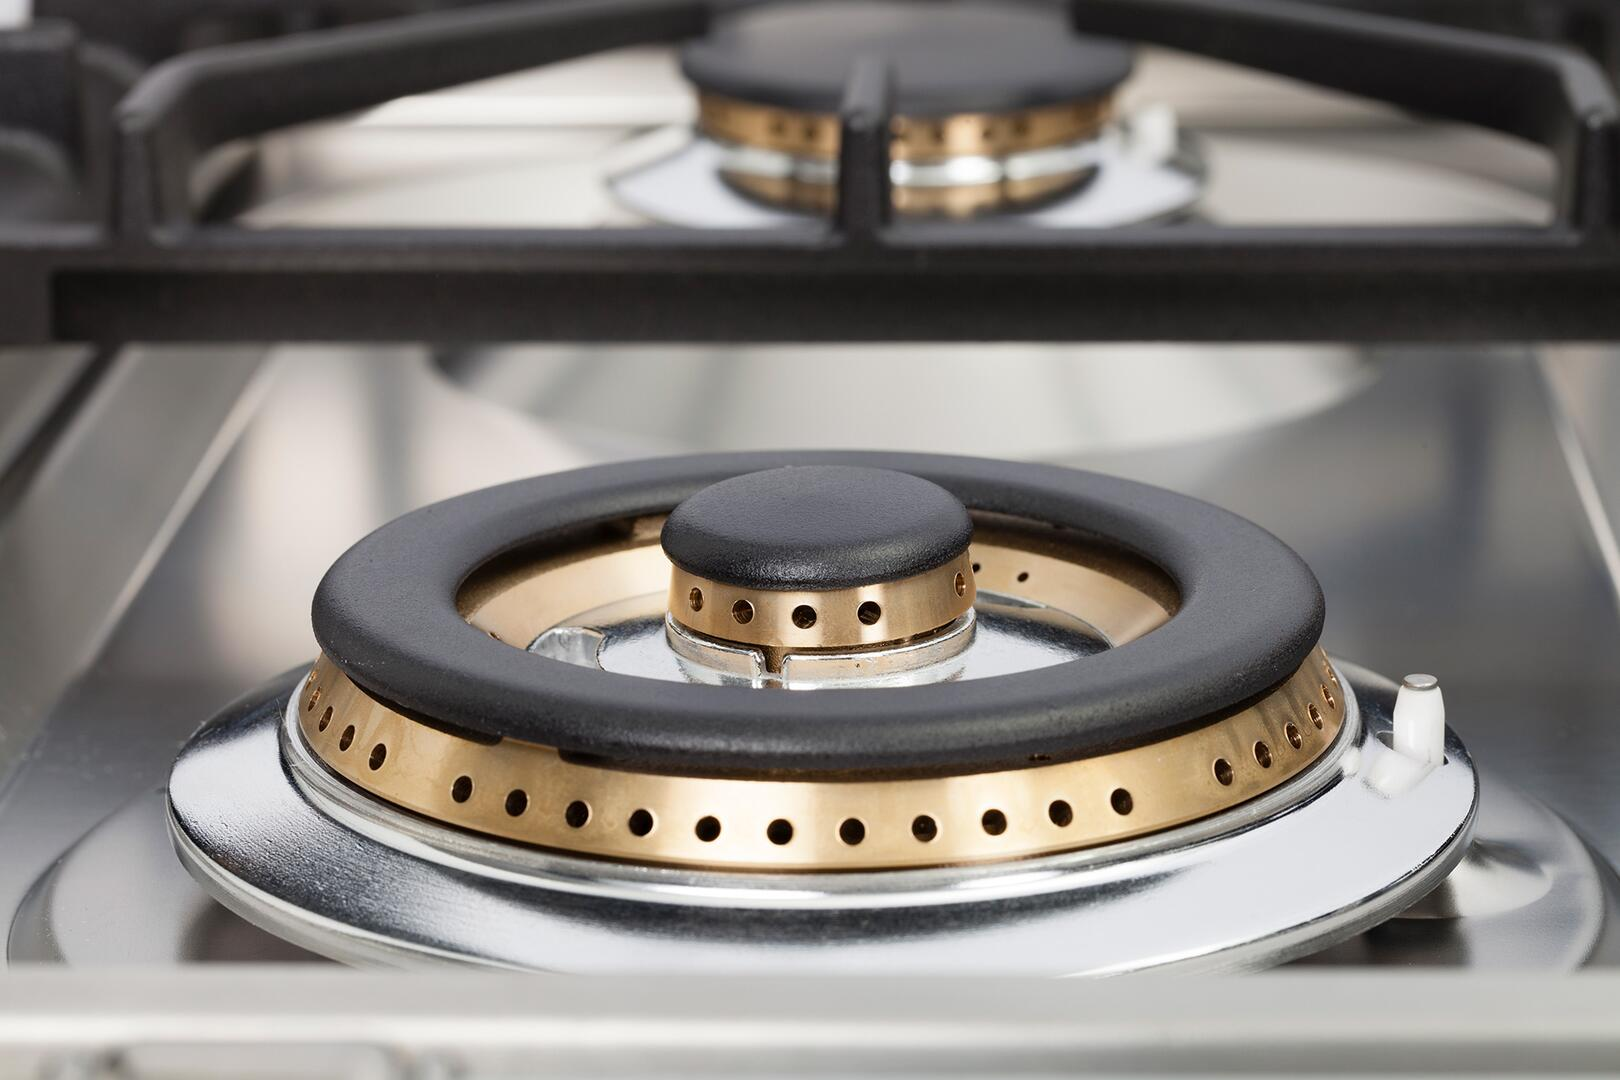 Ilve Professional Plus UPW90FDVGGB Freestanding Gas Range White, 26